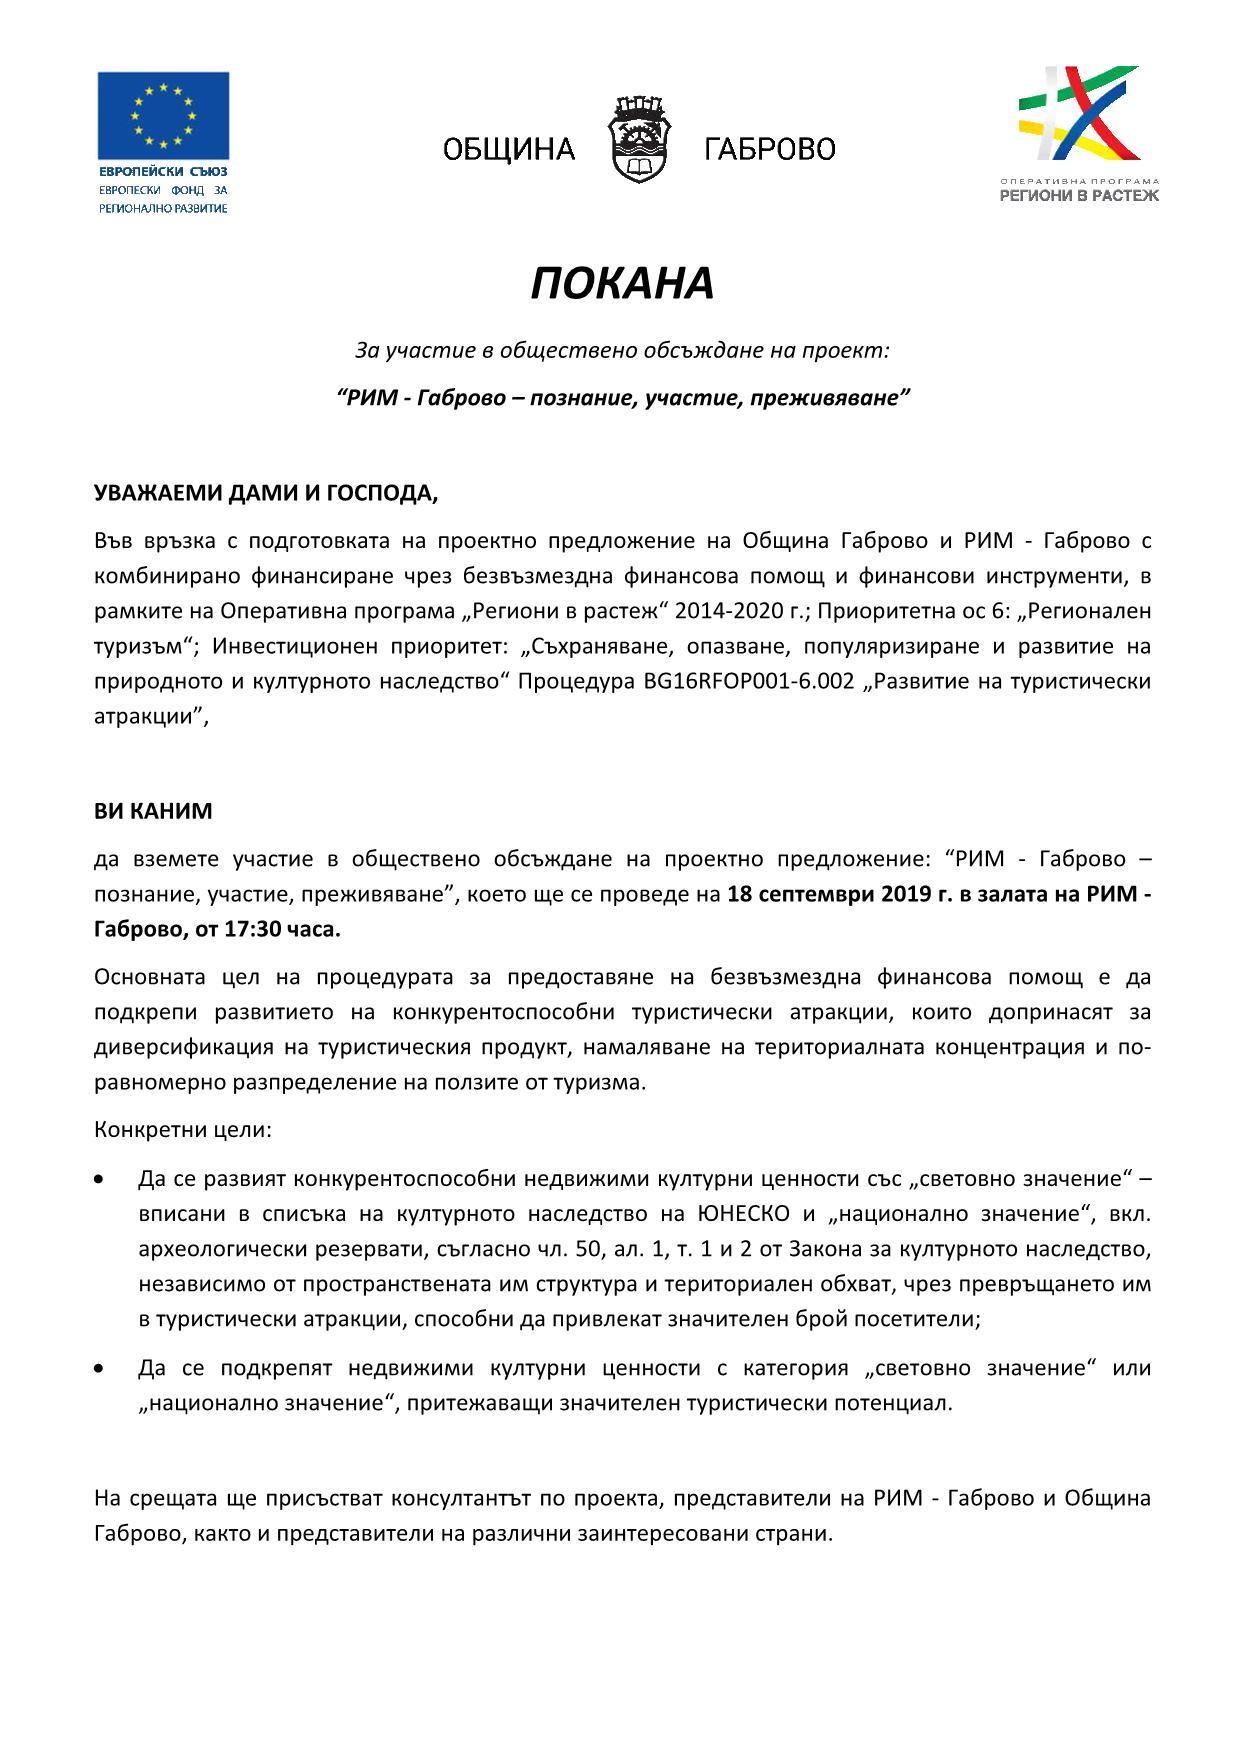 Pokana_publichno_obsujdane